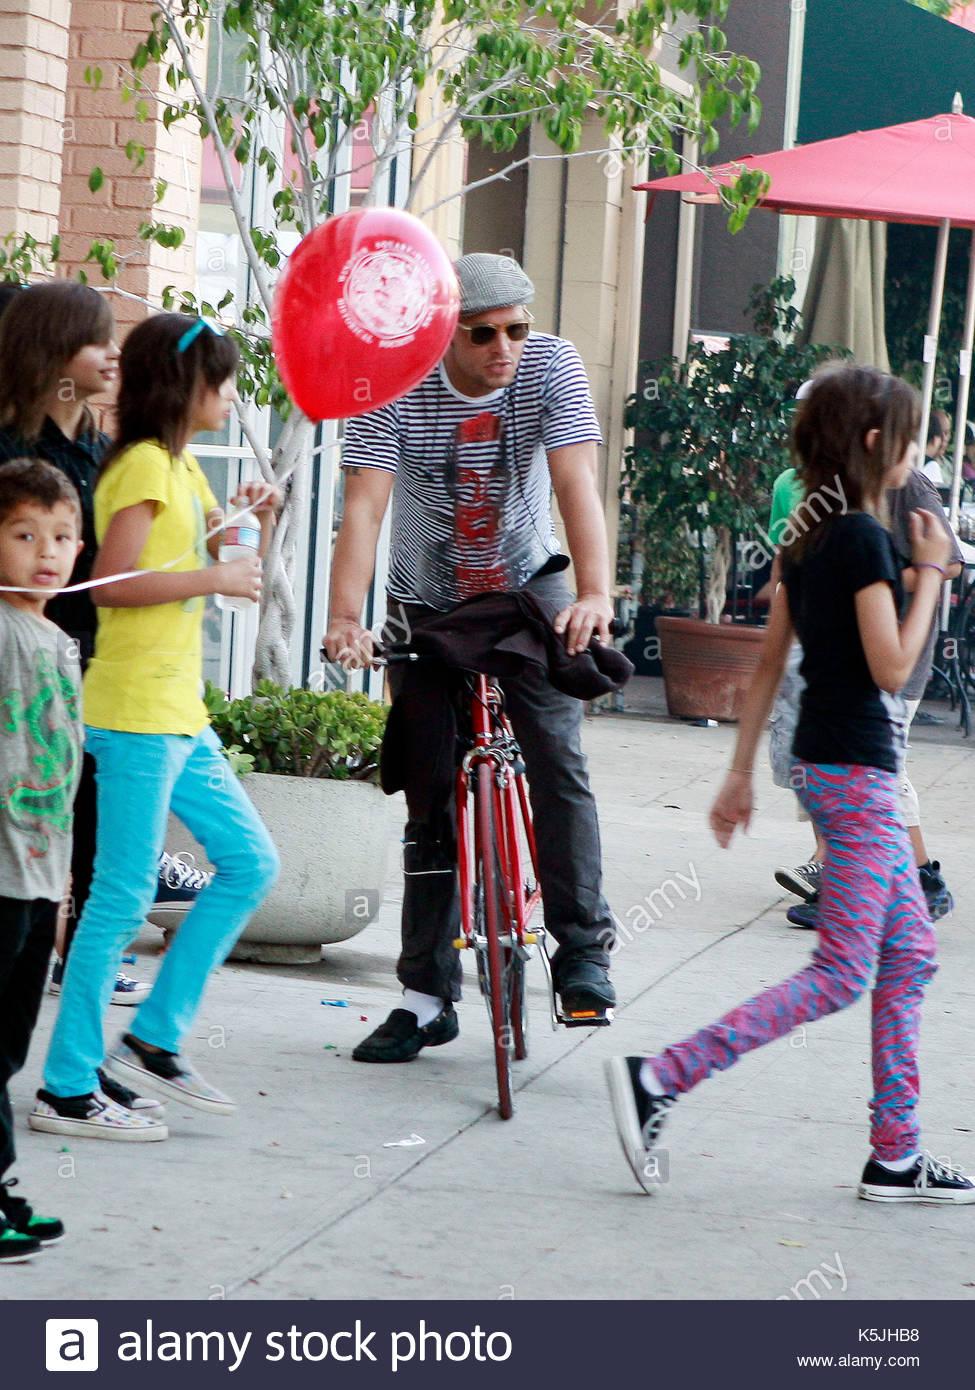 Justin chambers y niños. Anatomía \'grises\' el actor justin chambers ...